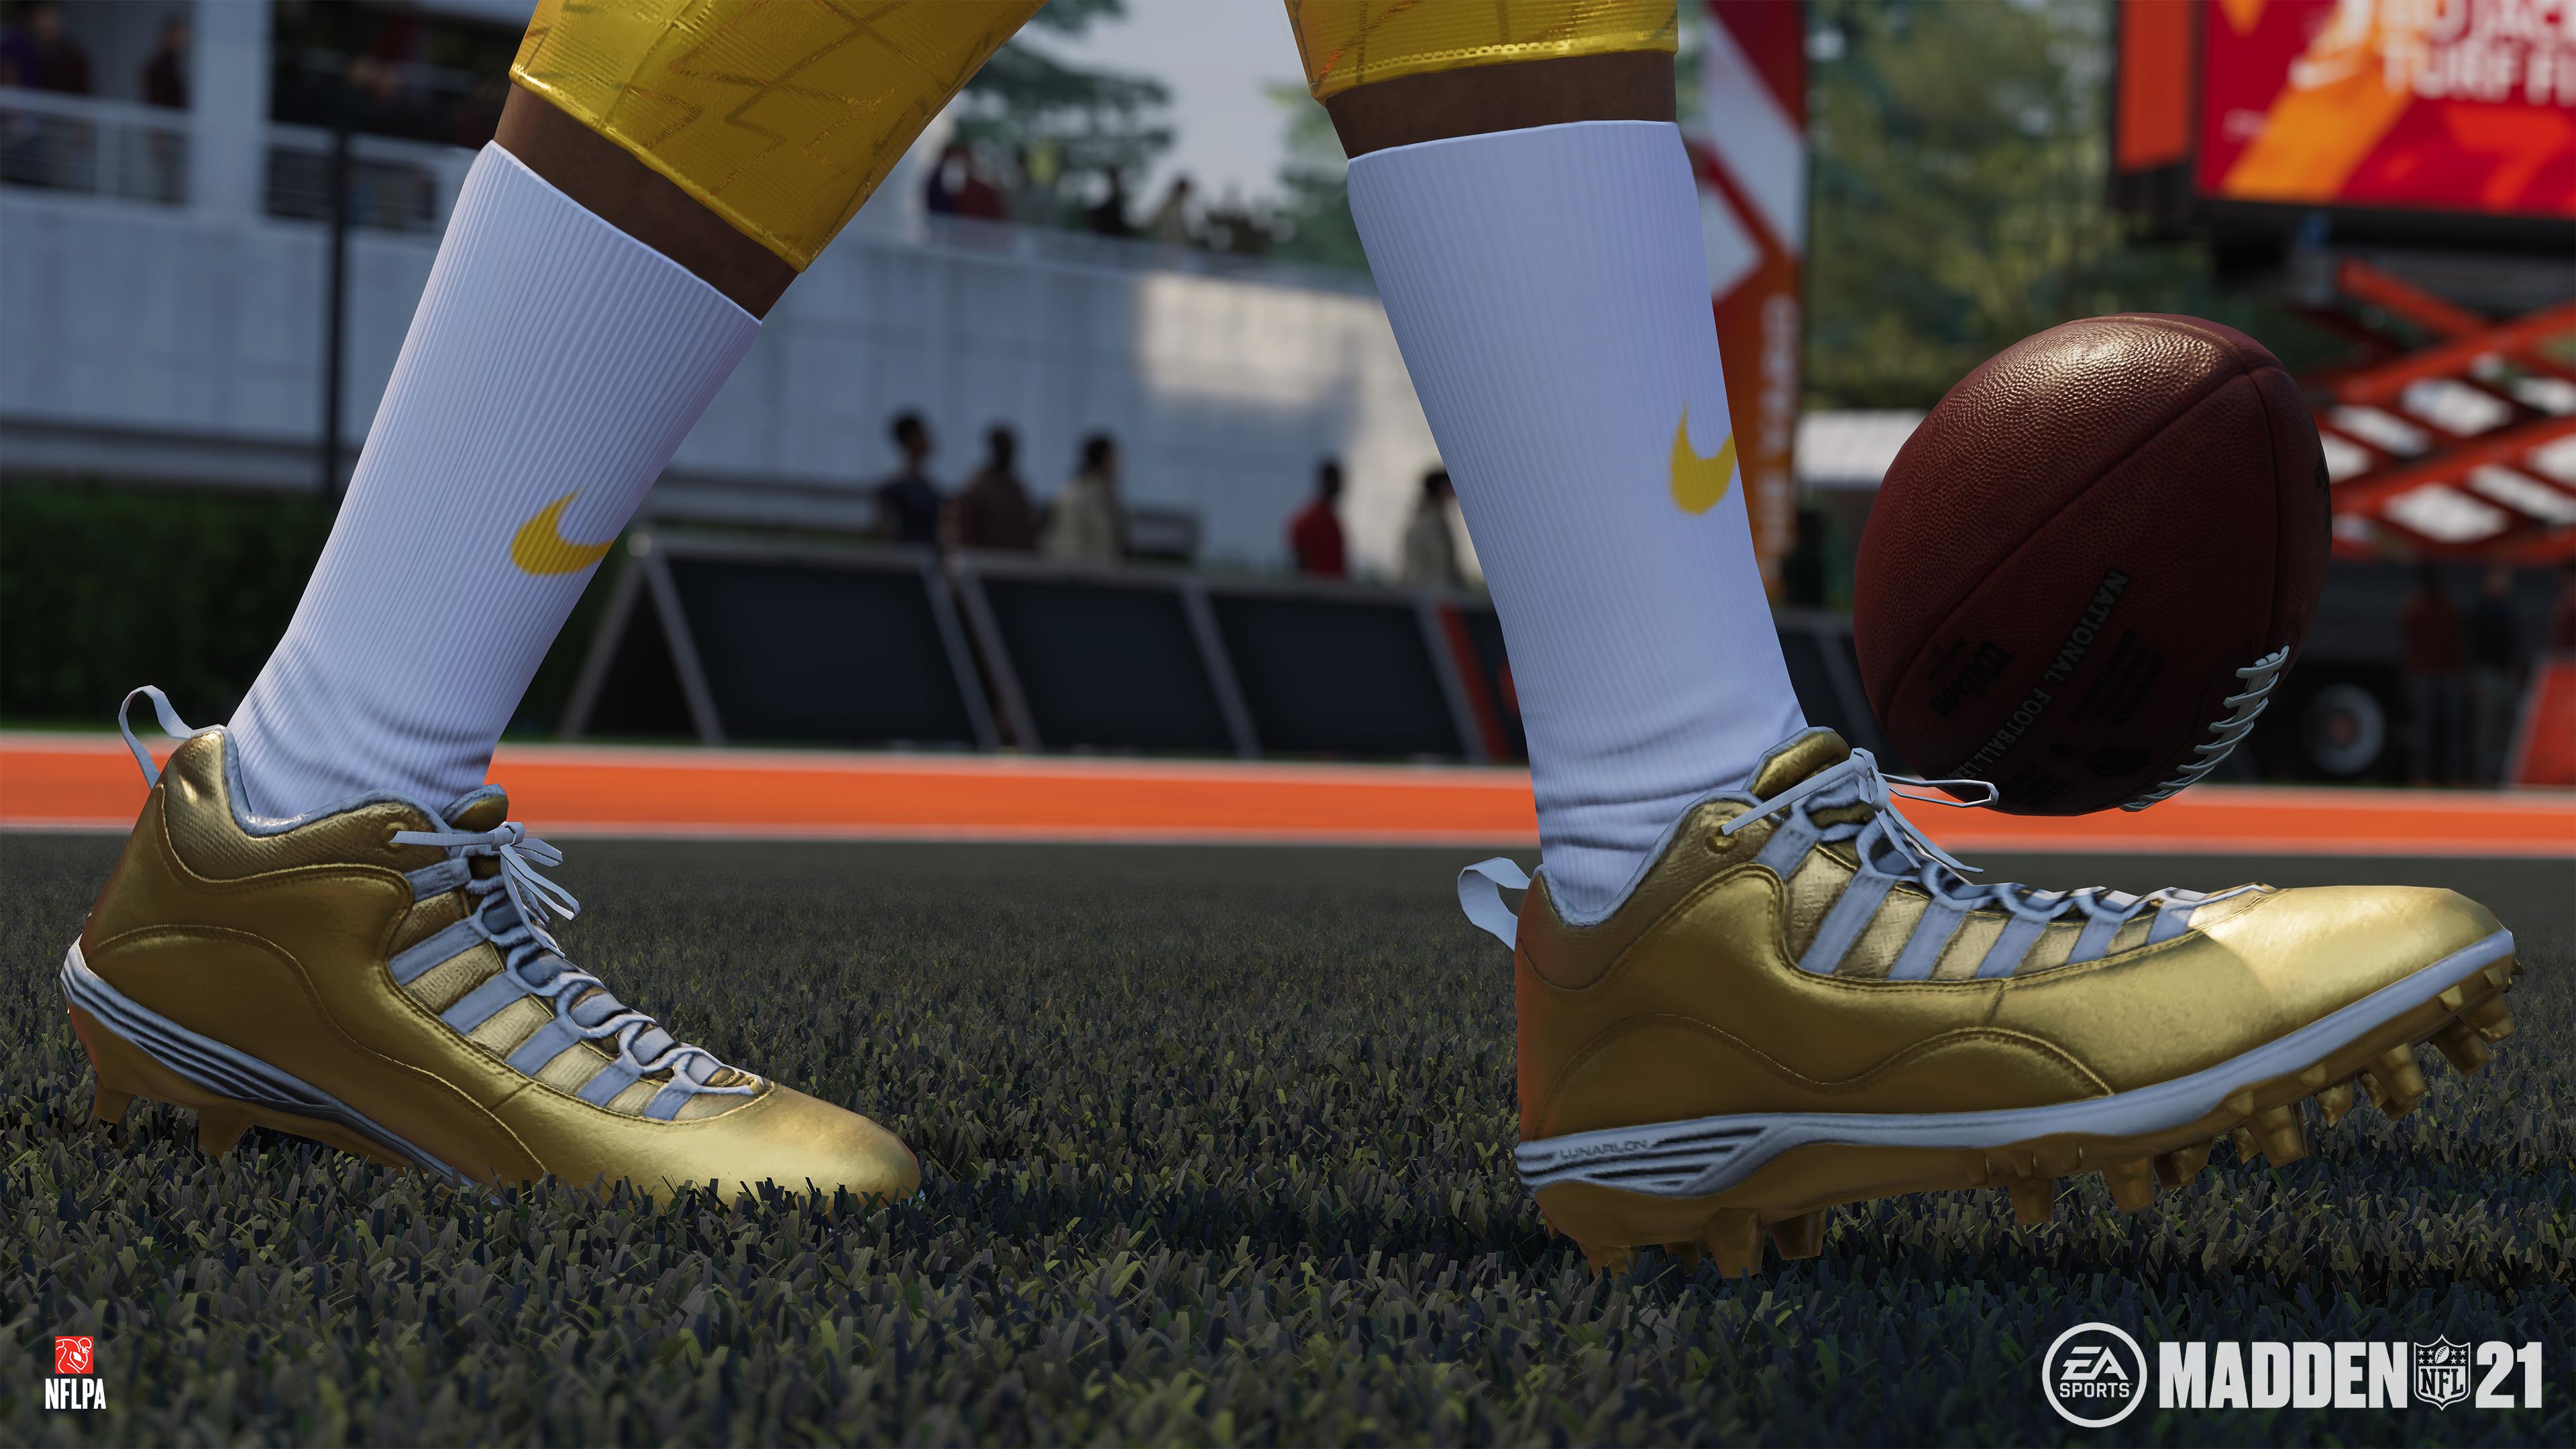 Nike x Madden NFL 21